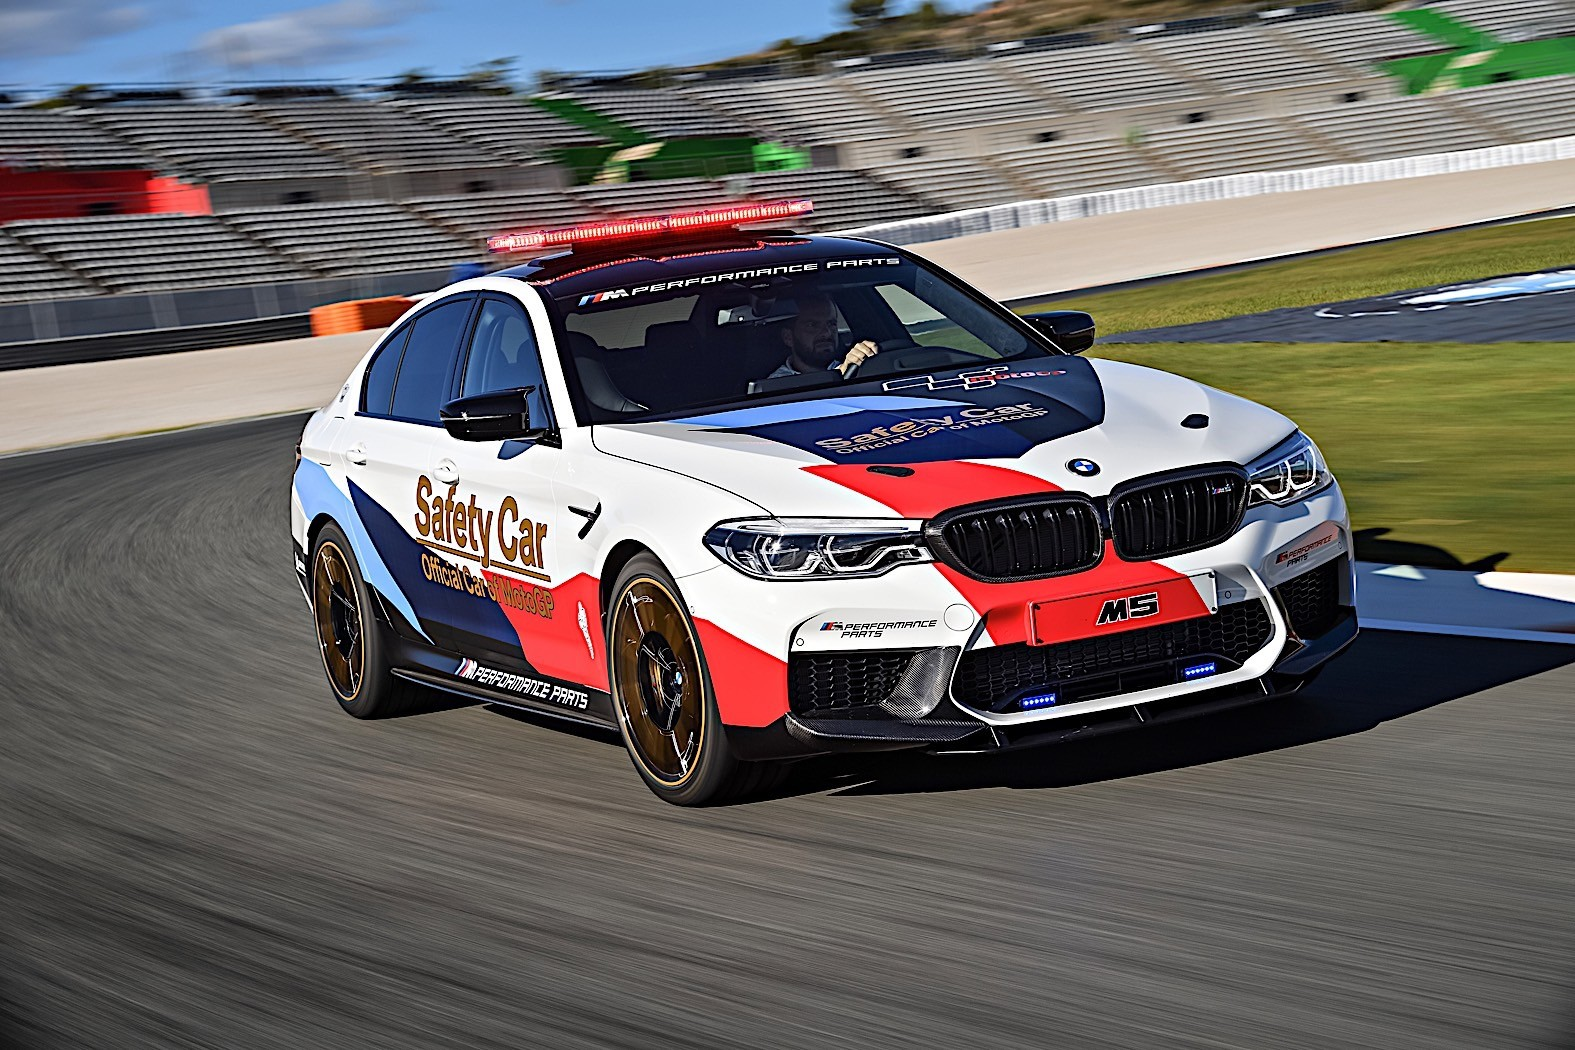 2018 BMW M5 MotoGP Safety Car Gets Ready For Season Start